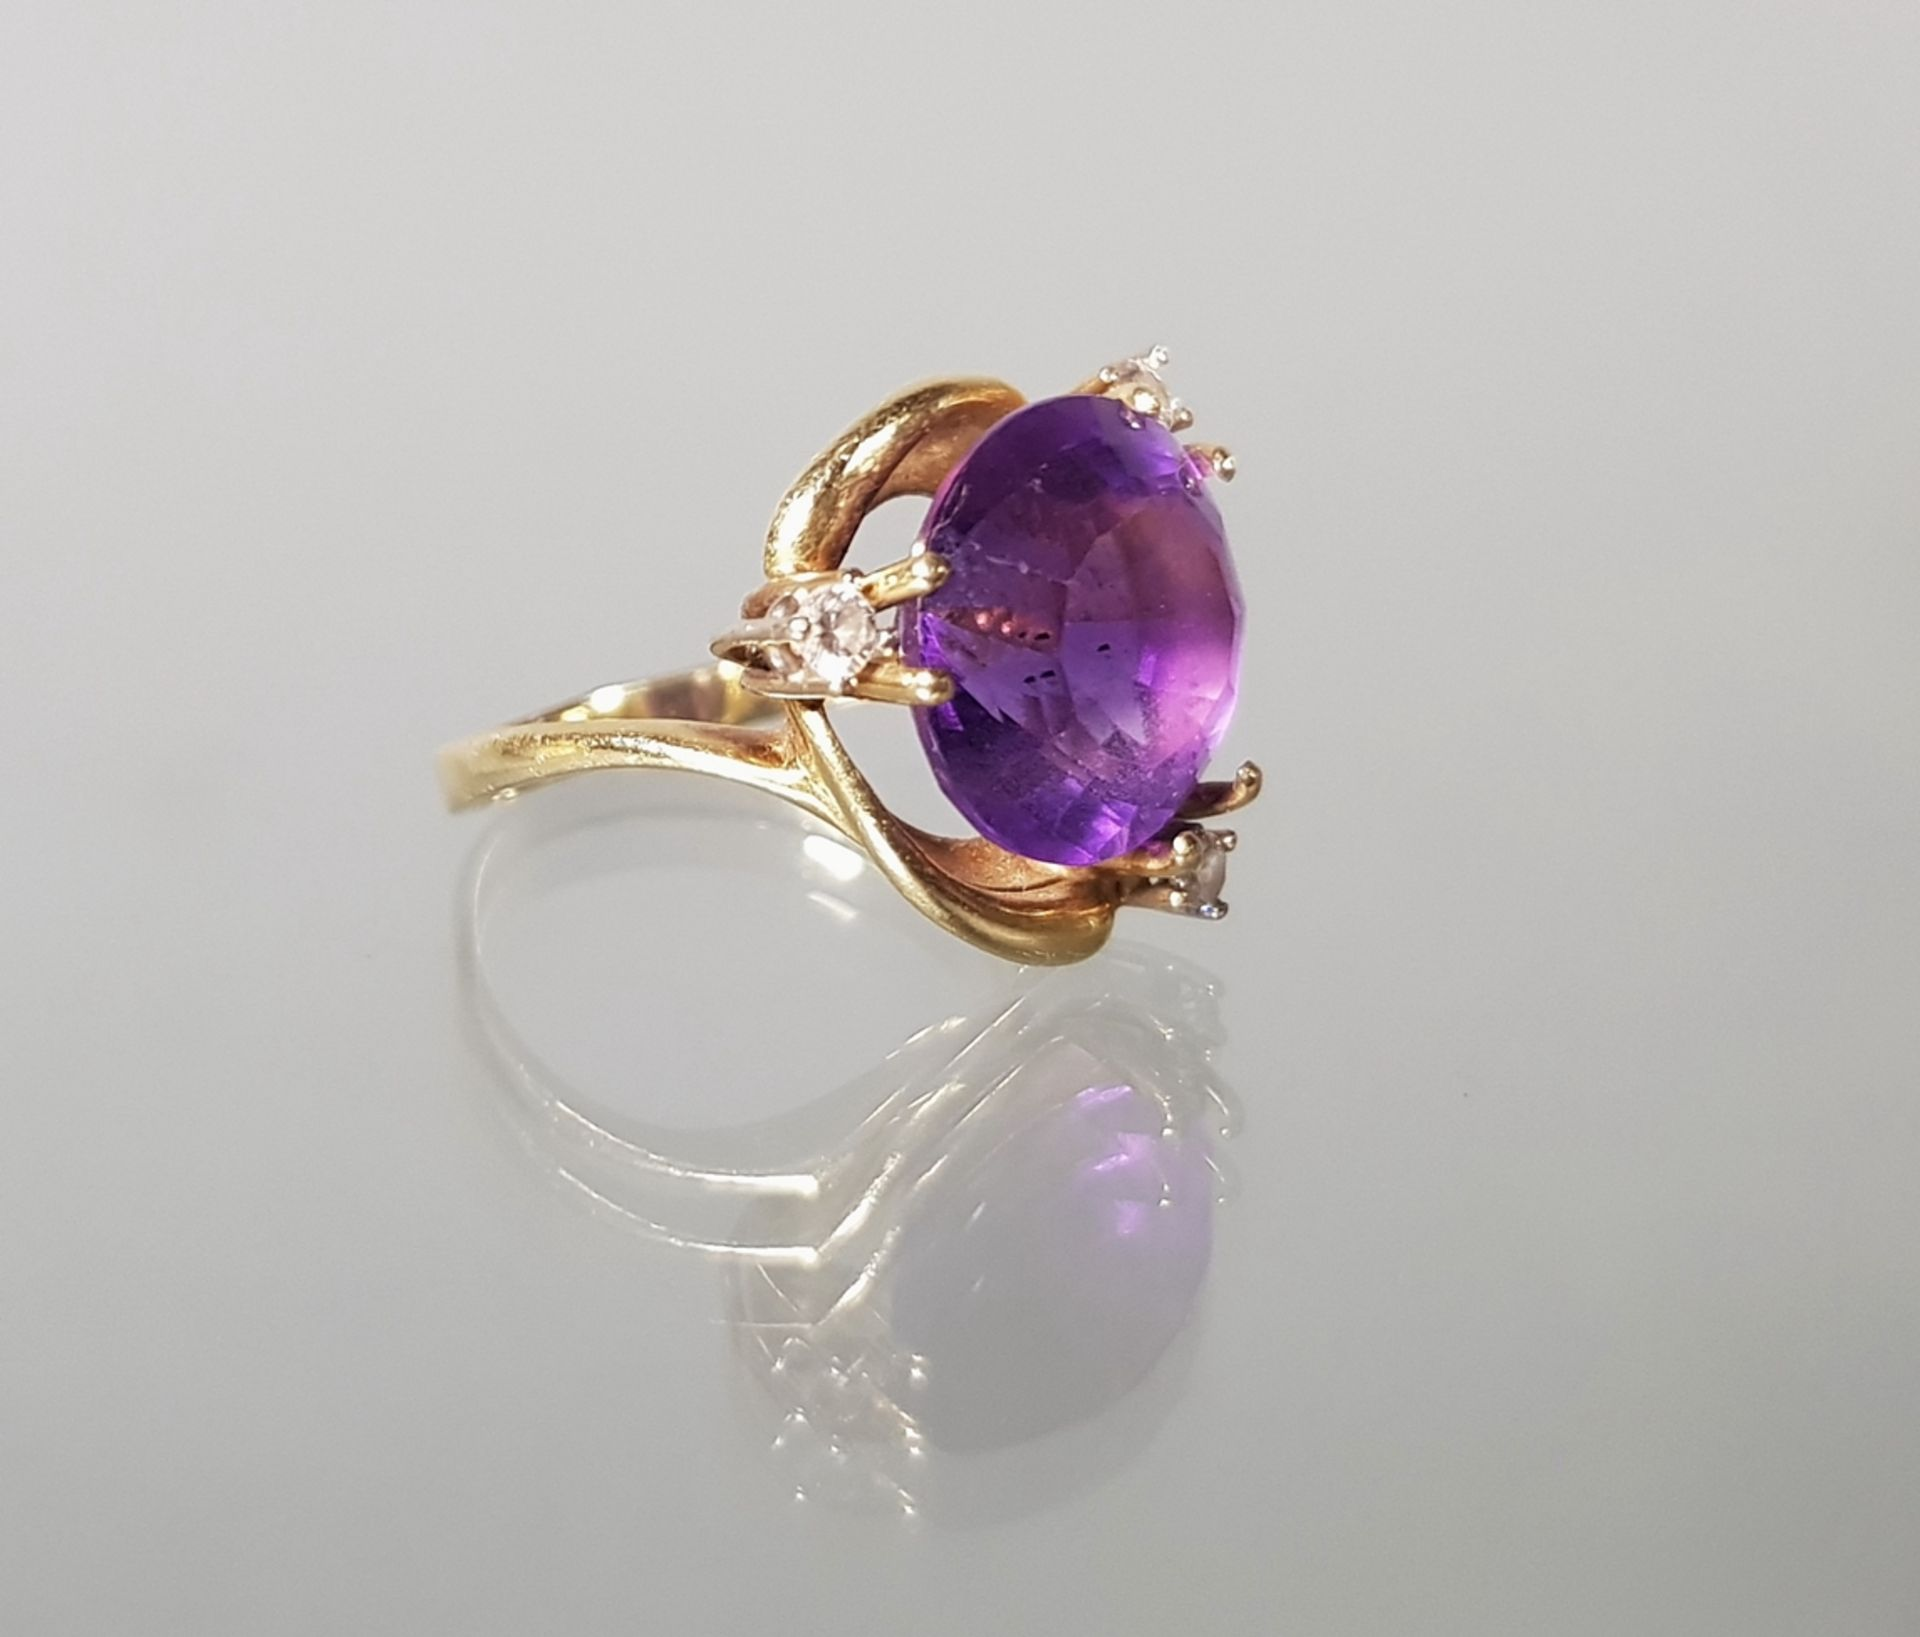 Ring, GG 585, 1 runder facettierter Amethyst, 3 Brillanten zus. ca. 0.15 ct., 4 g, RM 17